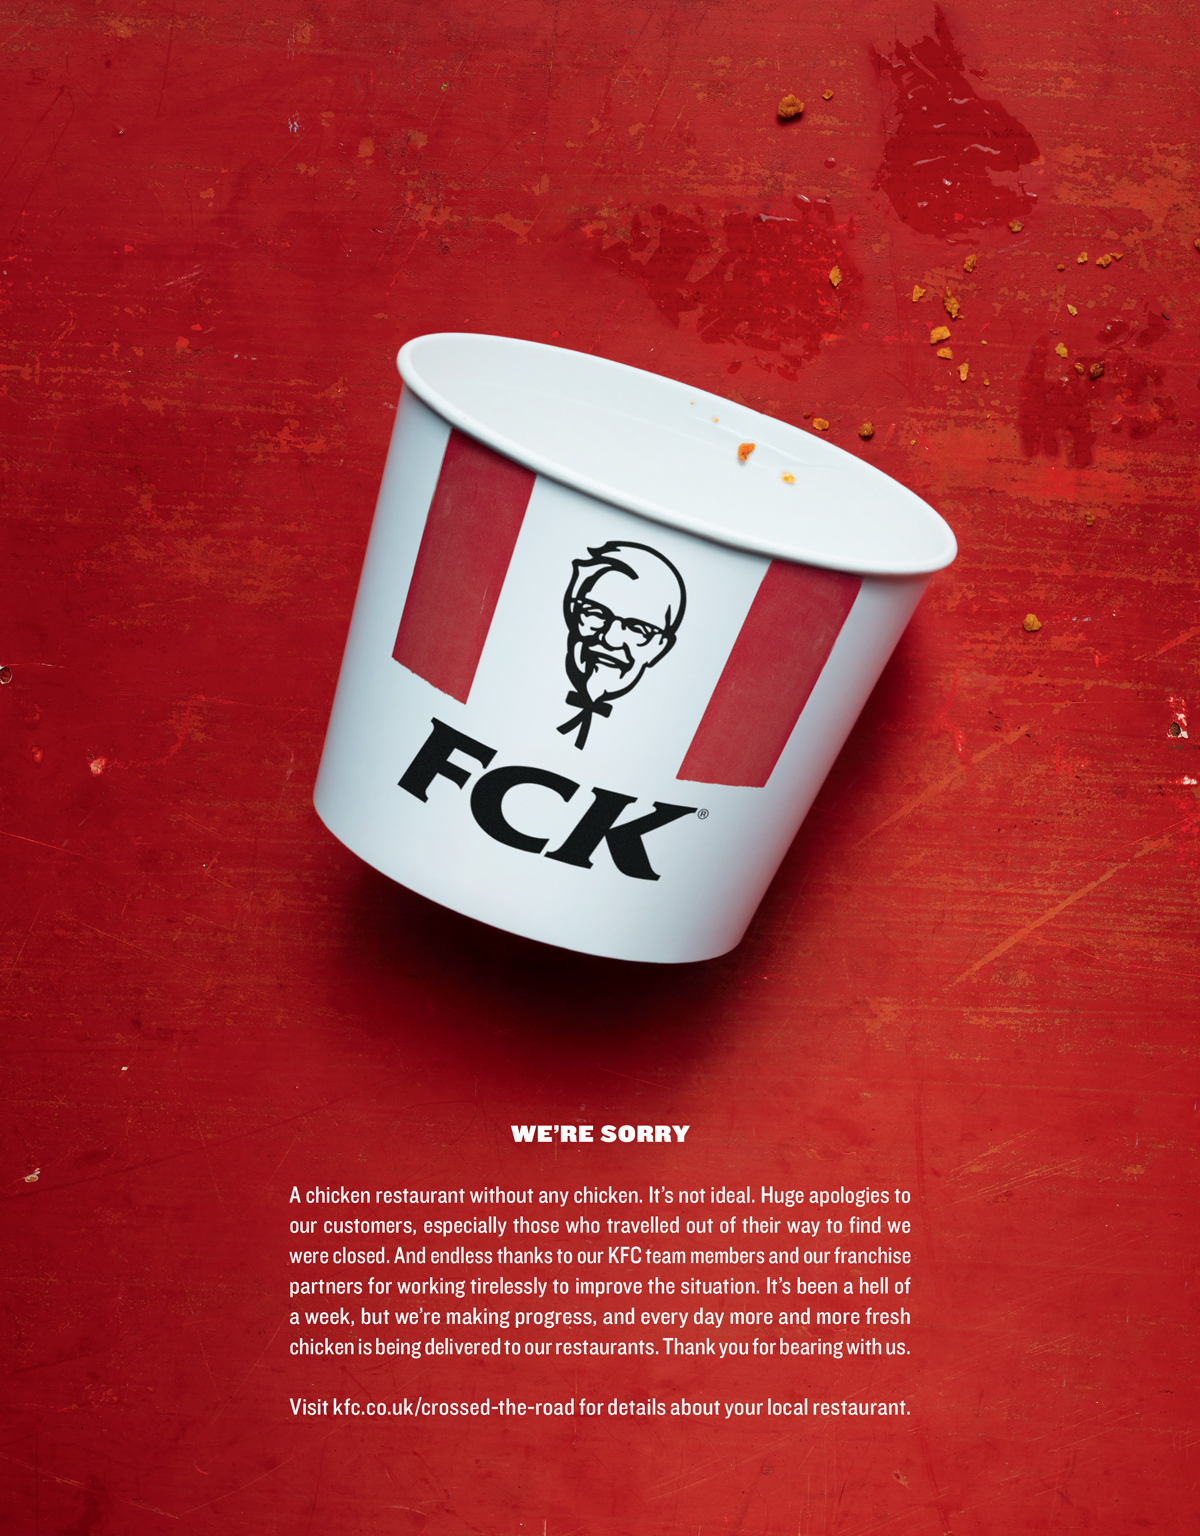 KFC-FCK-Apology-Chicken-Shortage